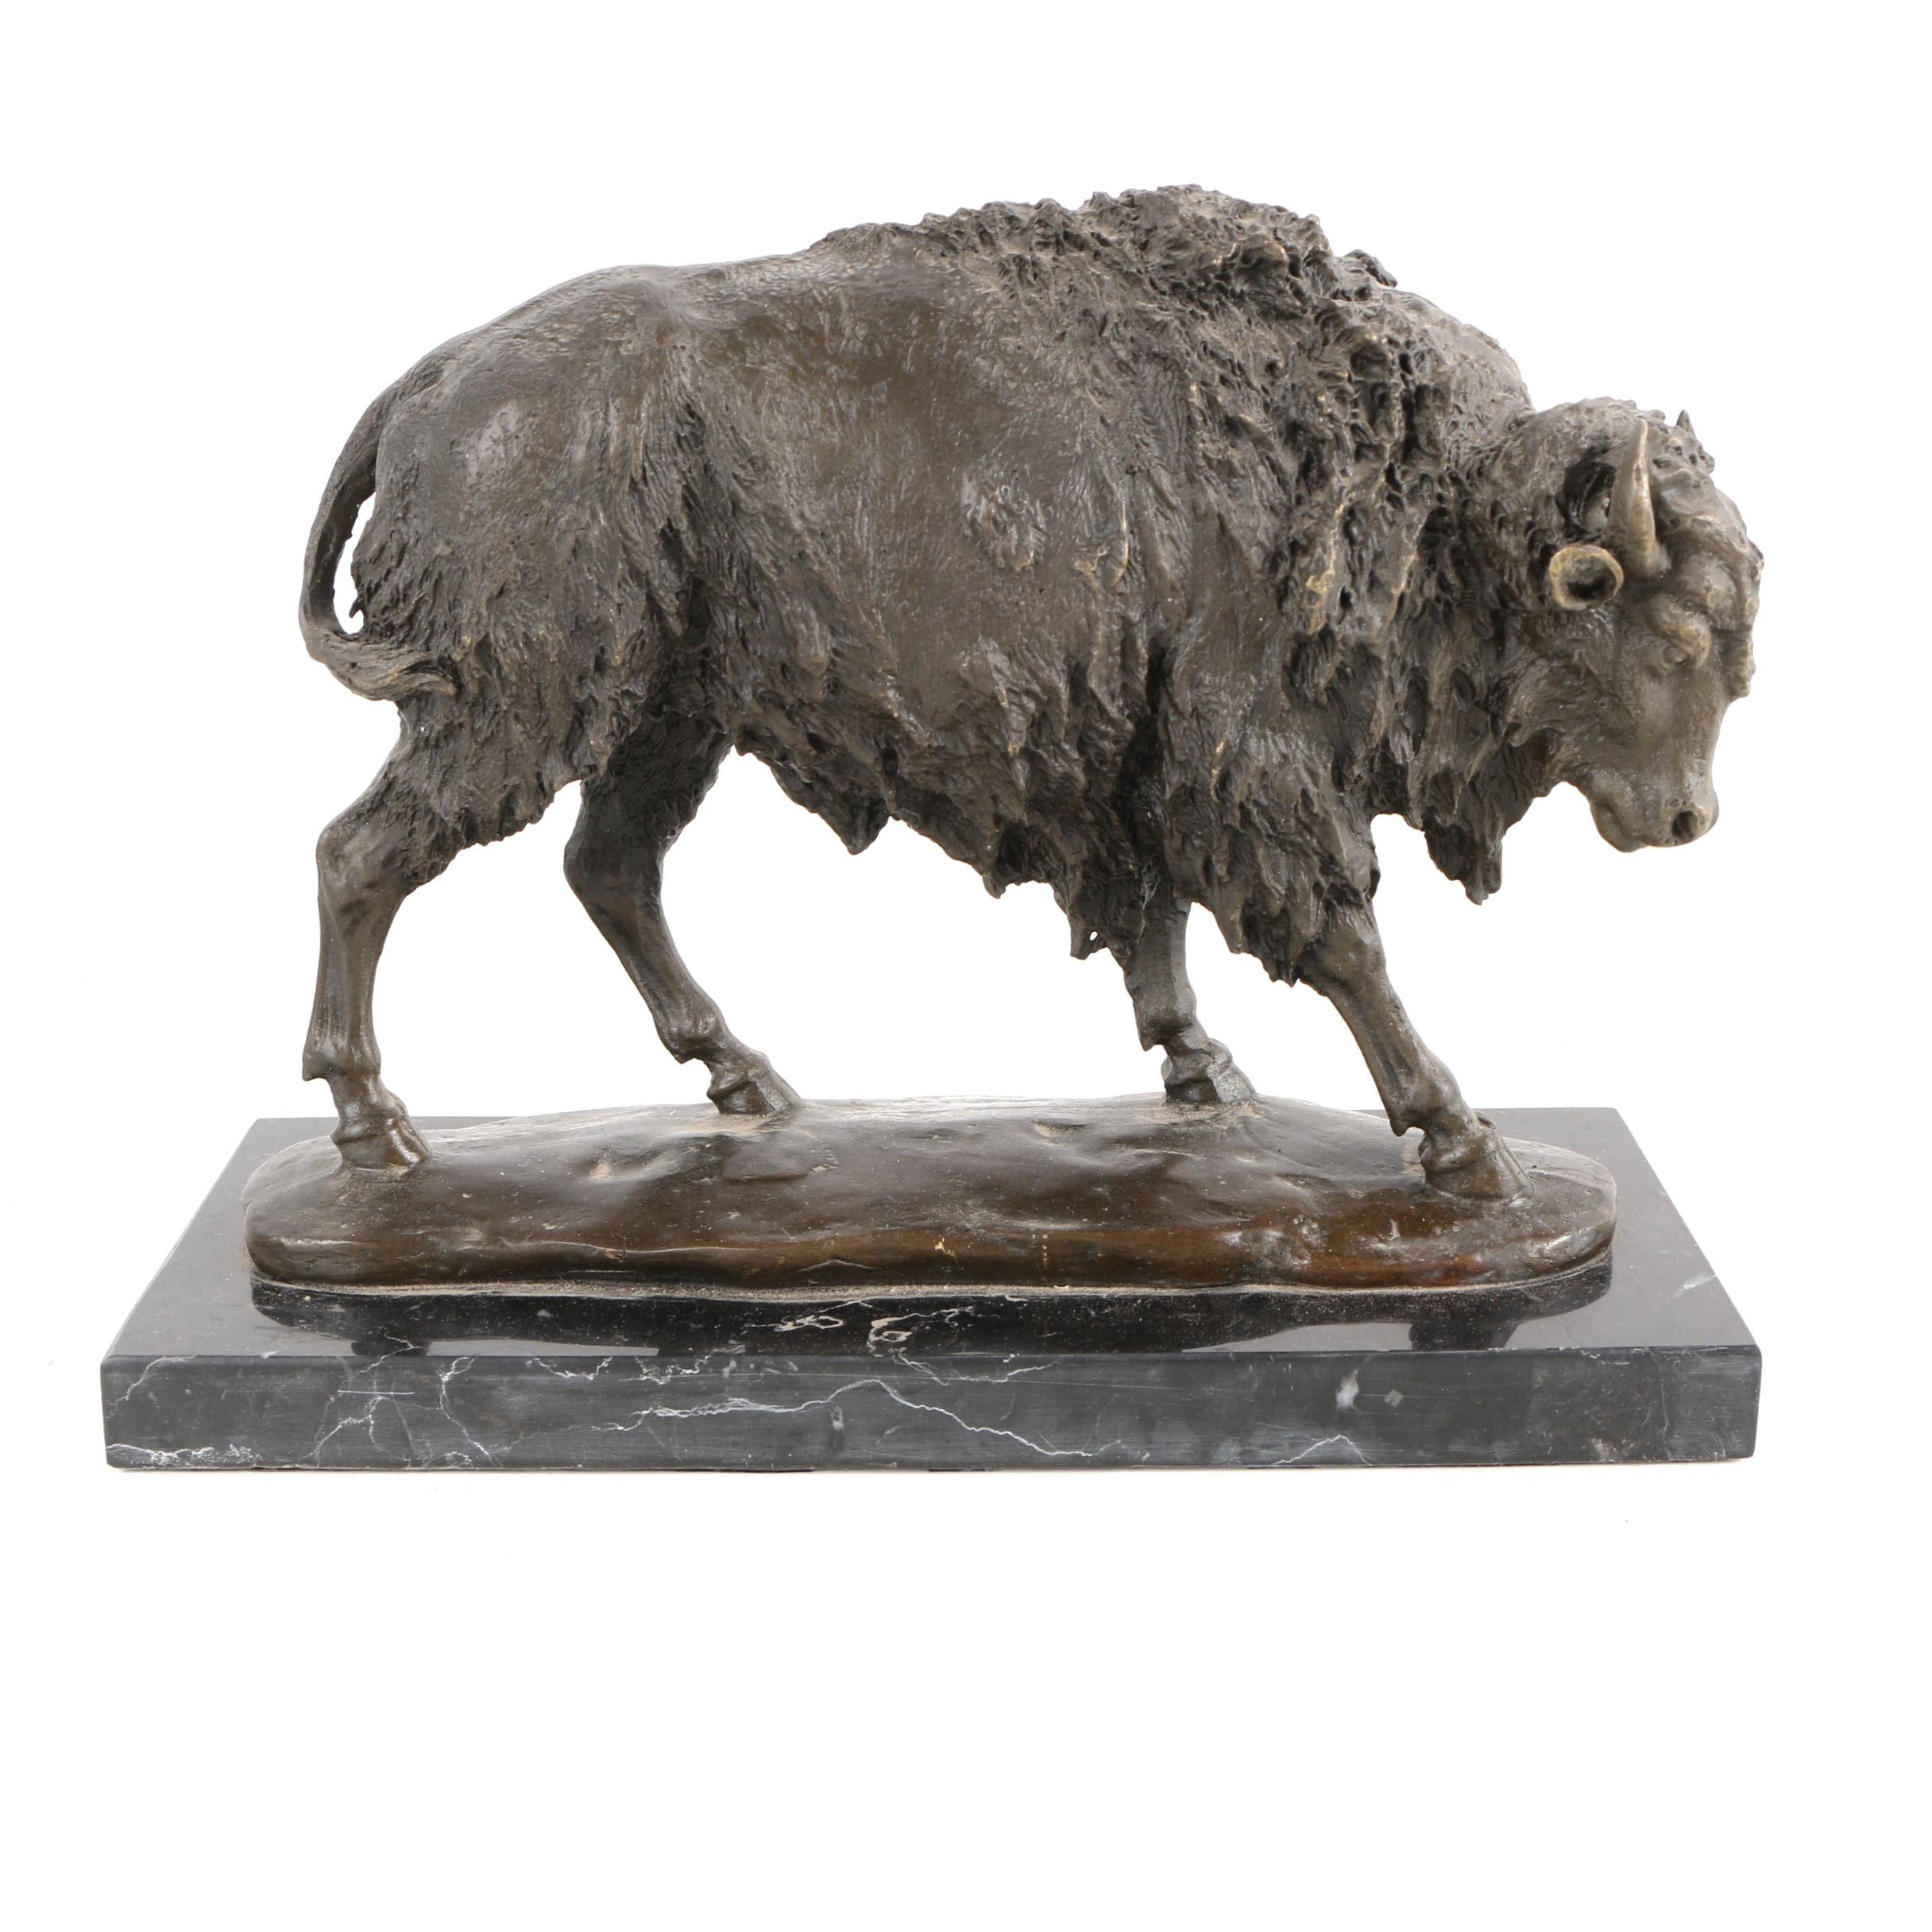 Brass Sculpture After Milo of a Bison